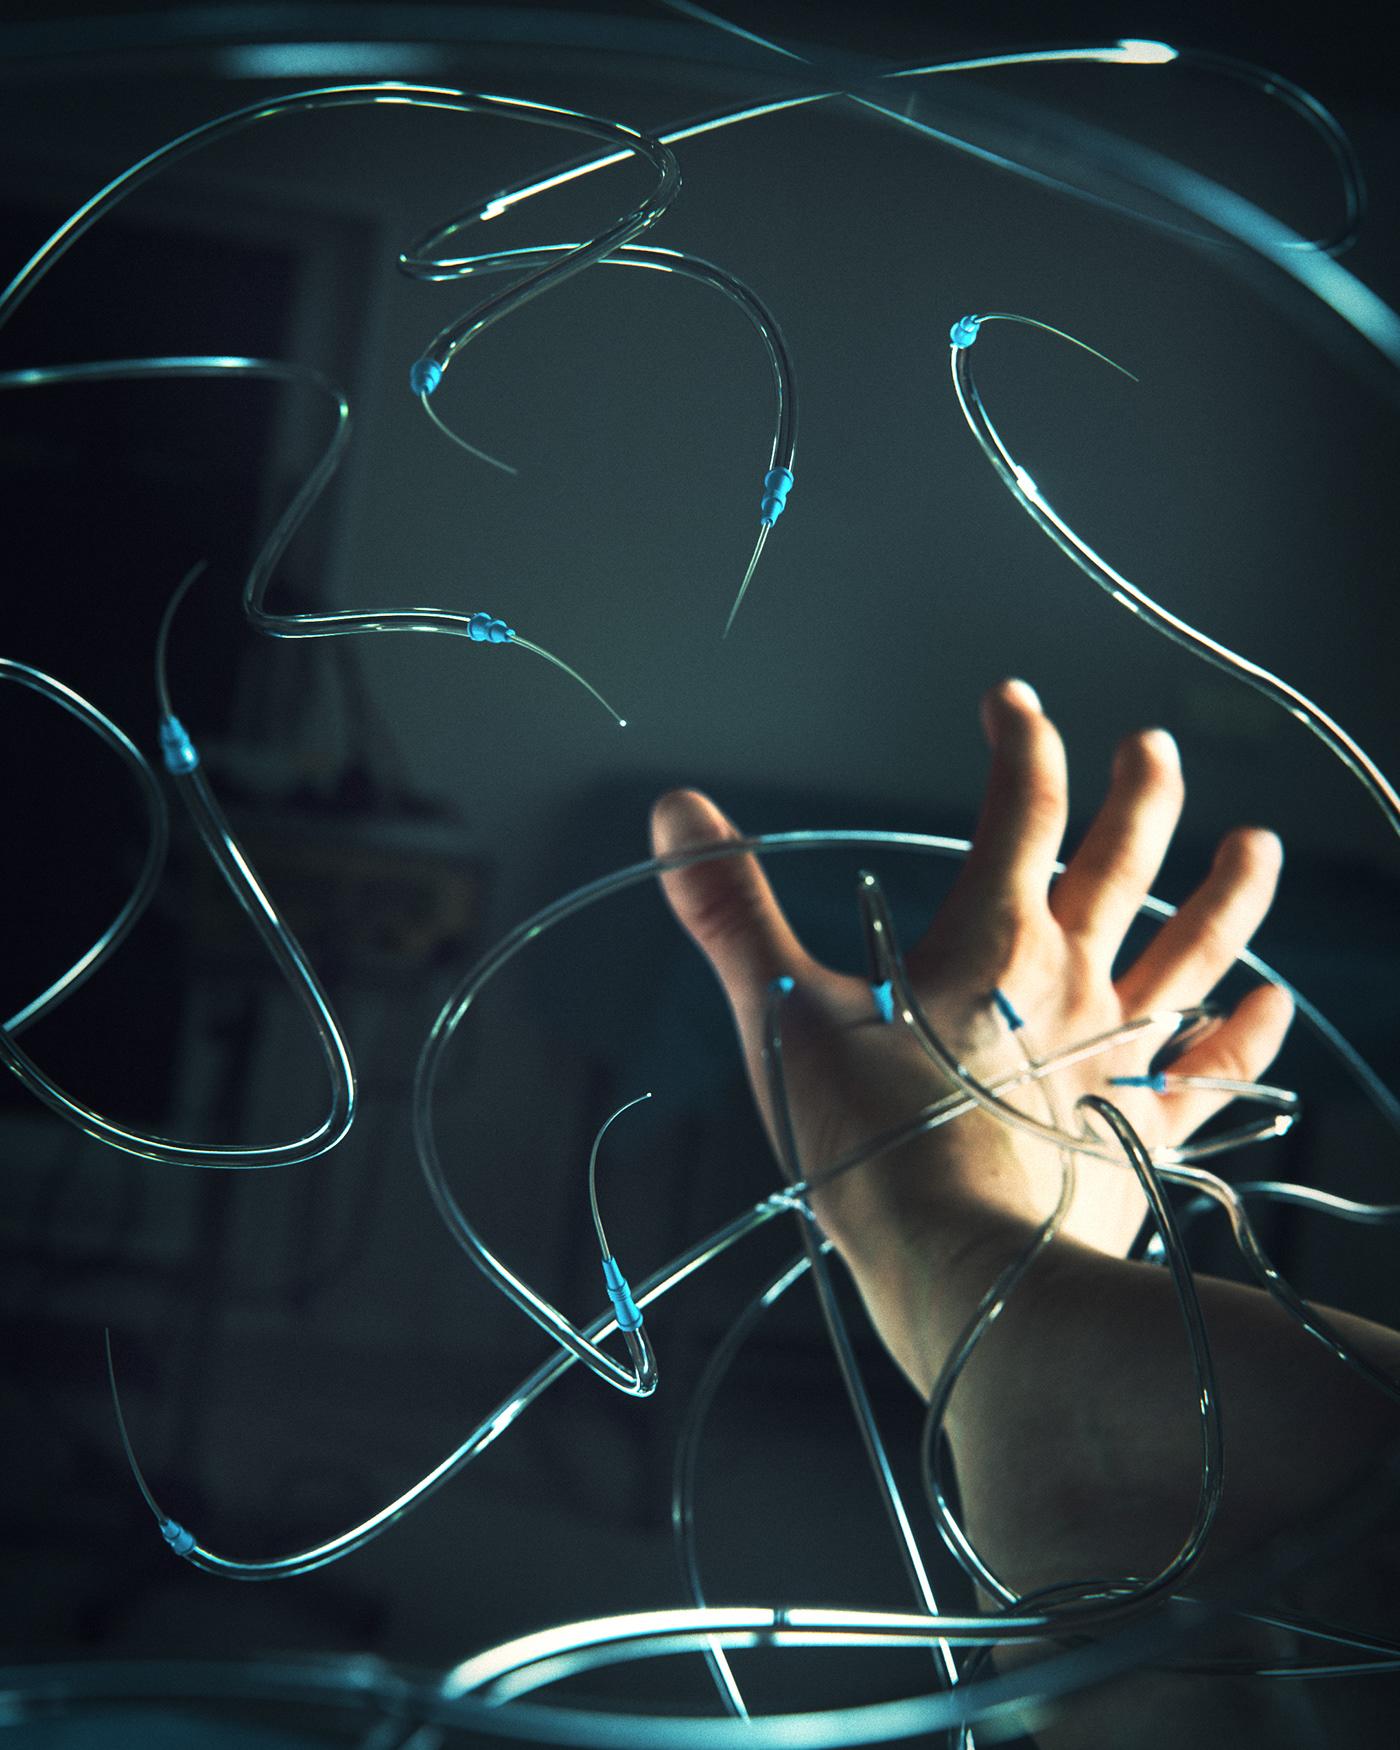 3D art cancer chemo cryptoart digitalart needles nft Render vfx